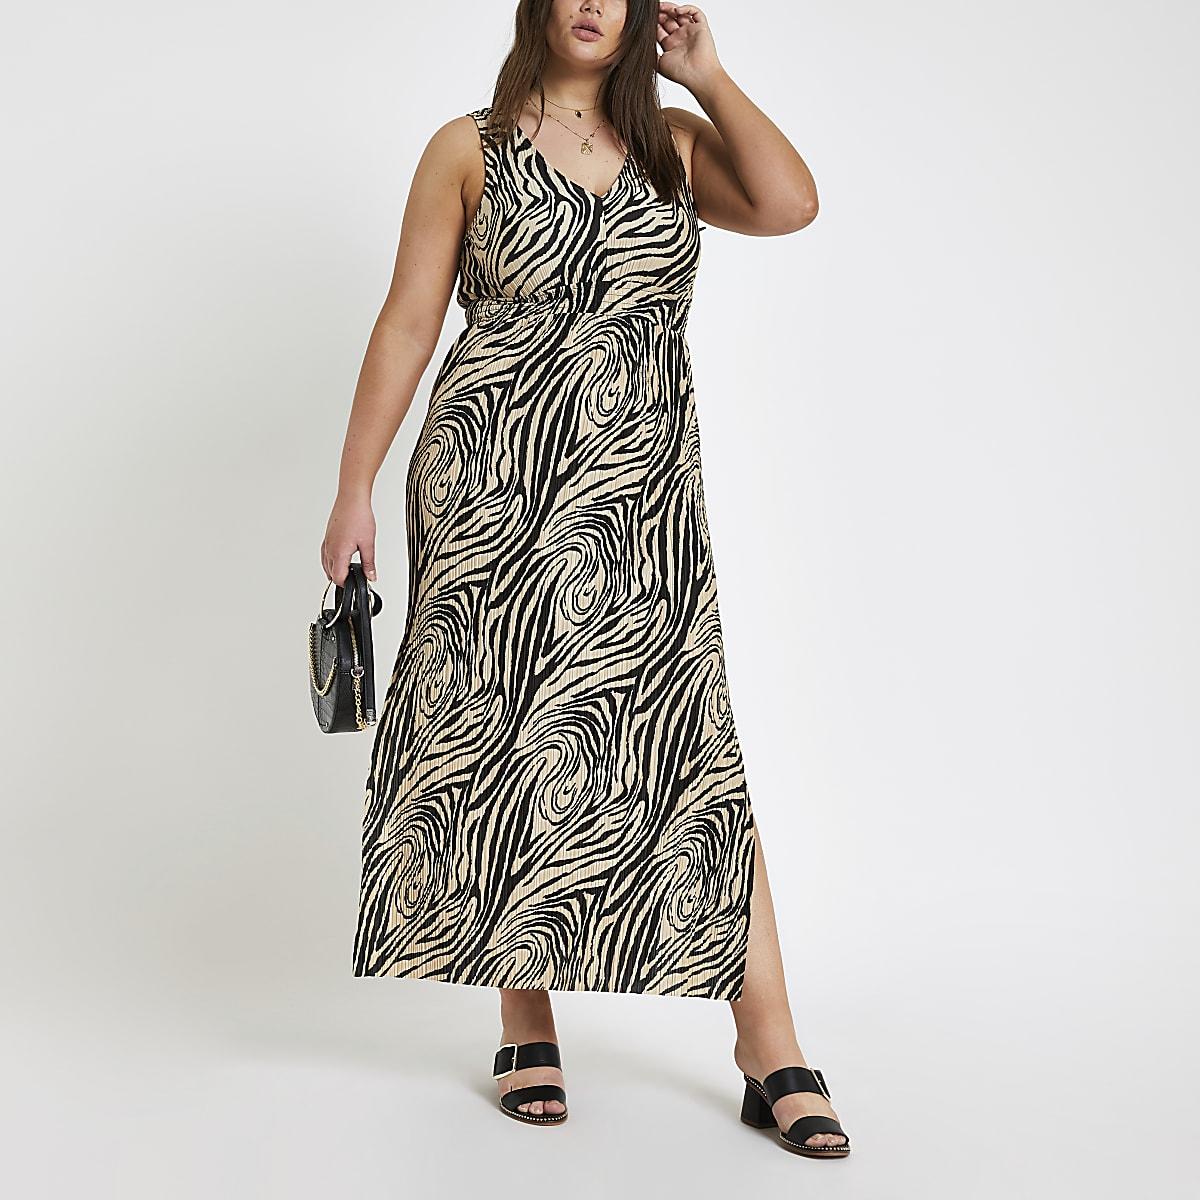 50b2ad315eba4e RI Plus - Zwarte maxi-jurk met zebraprint - Maxi-jurken - Jurken - Dames